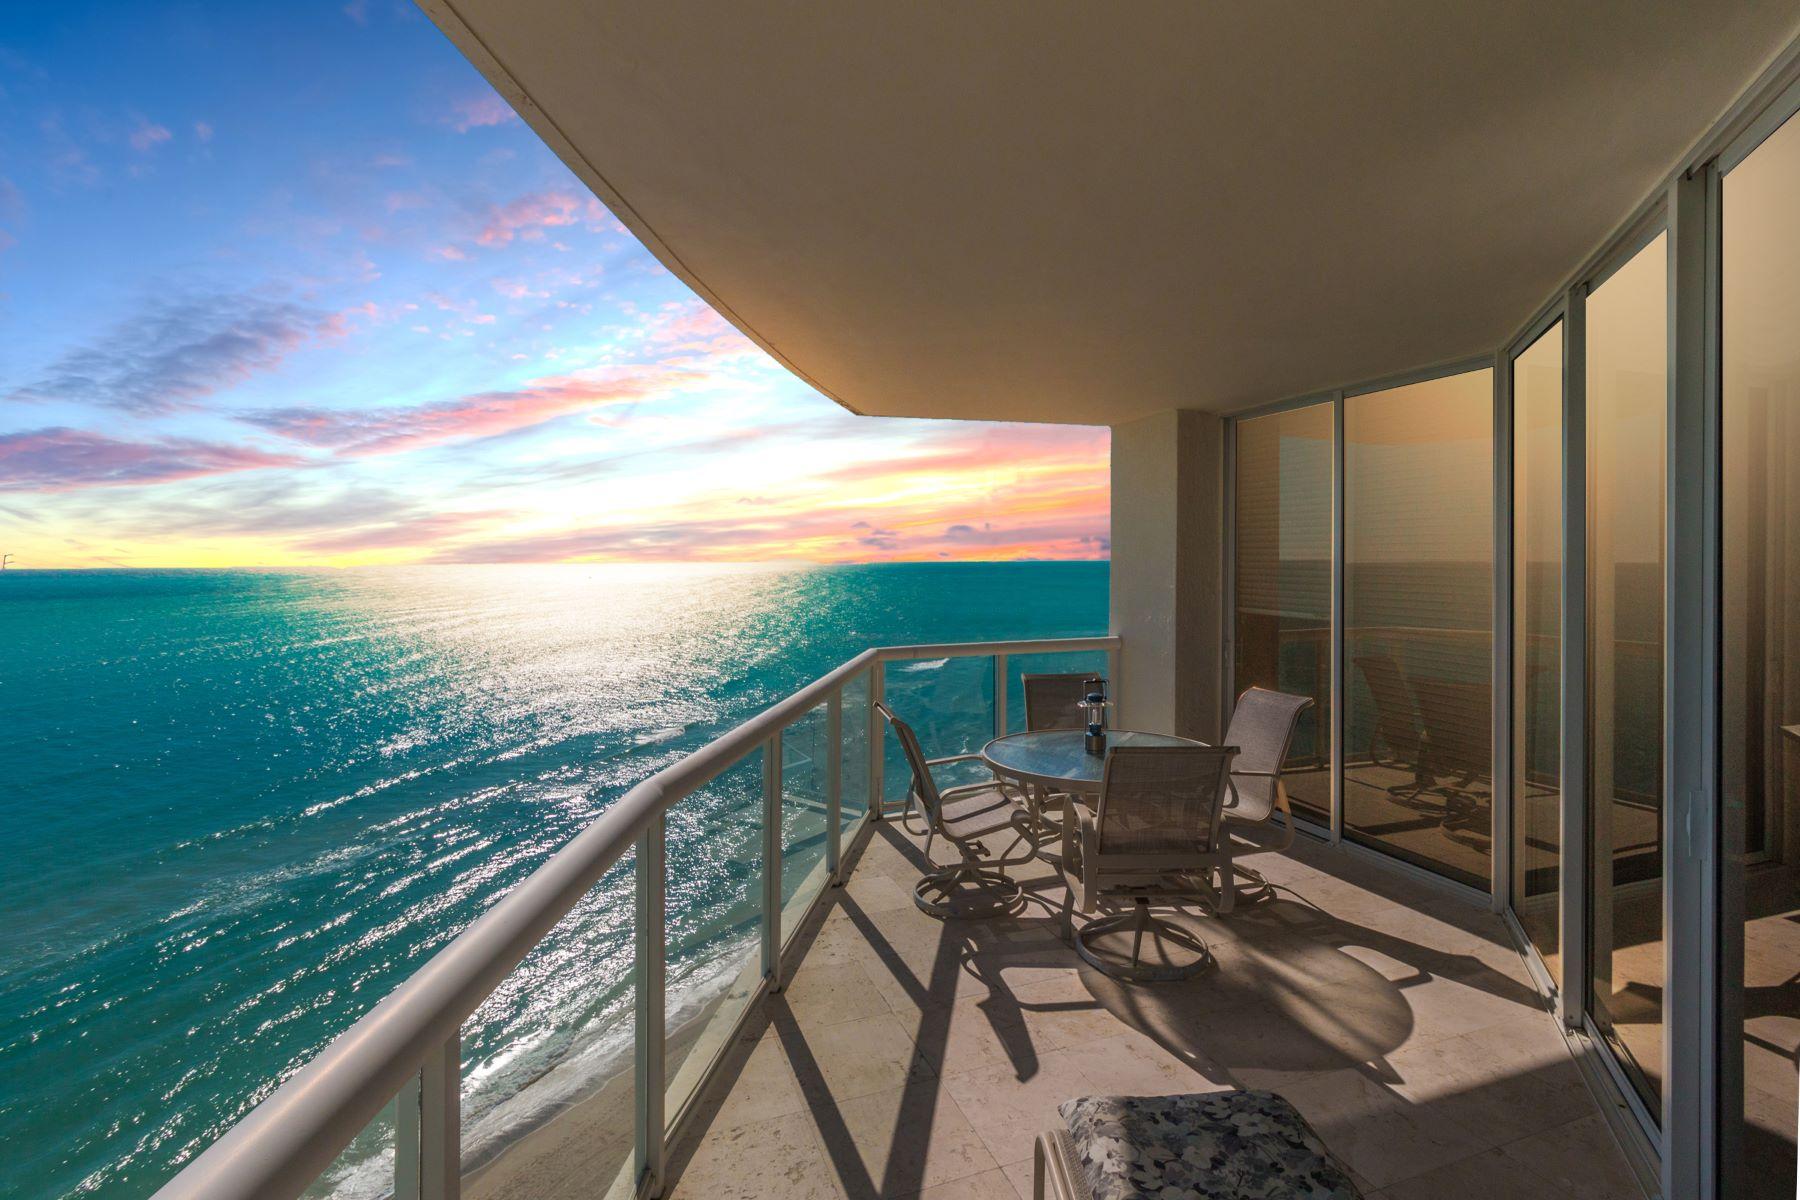 شقة بعمارة للـ Sale في 18671 Collins Ave 18671 Collins Ave 1902, Sunny Isles Beach, Florida, 33160 United States